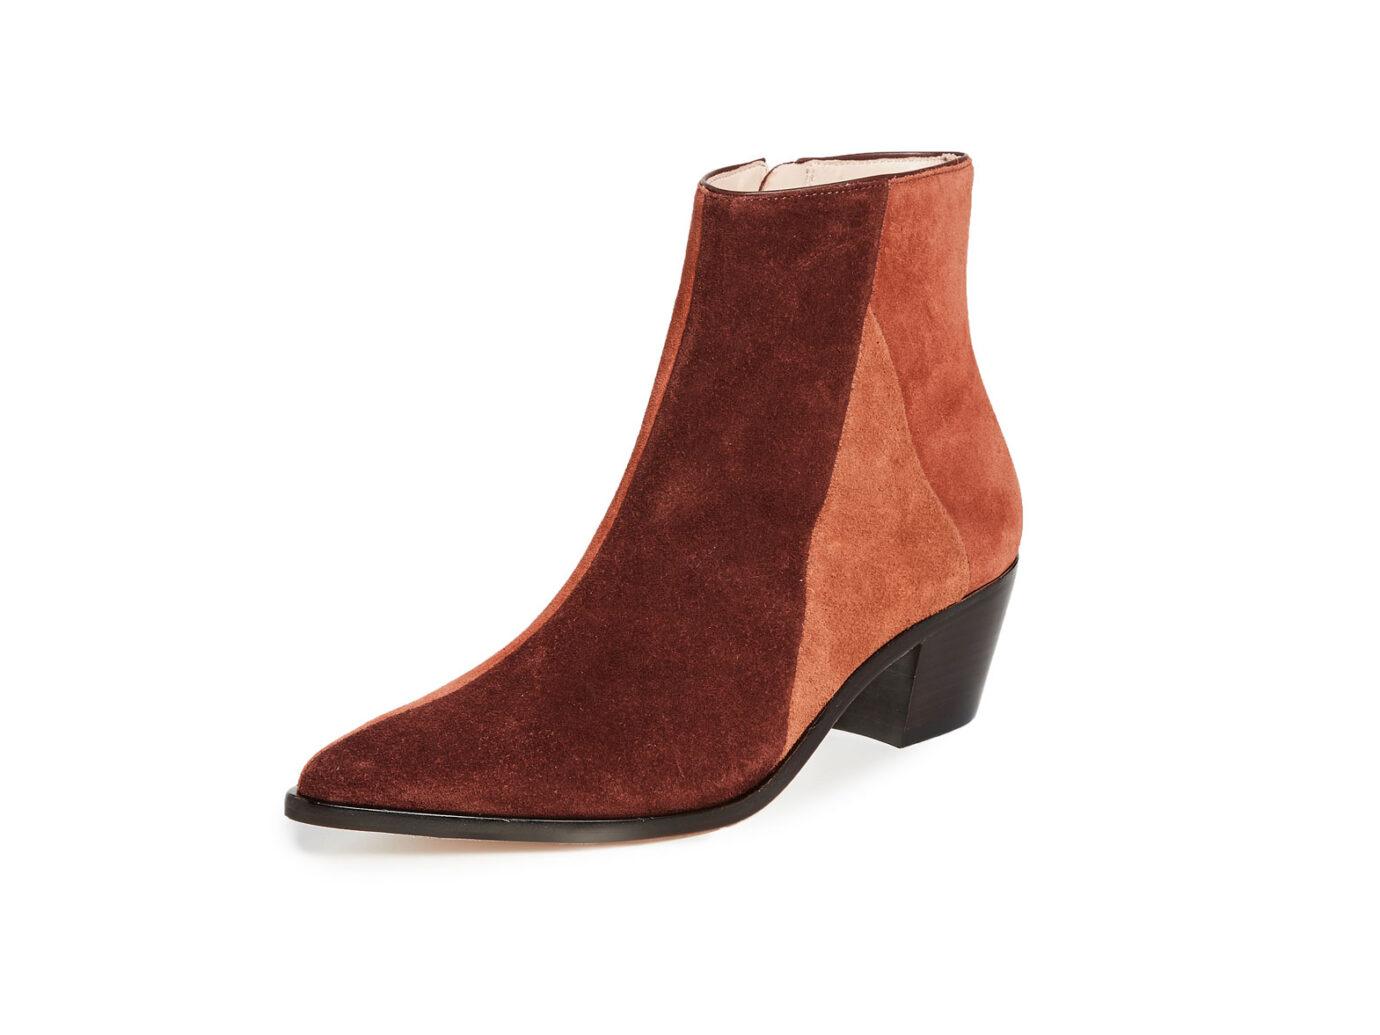 Ulla Johnson Lola Ankle Boots